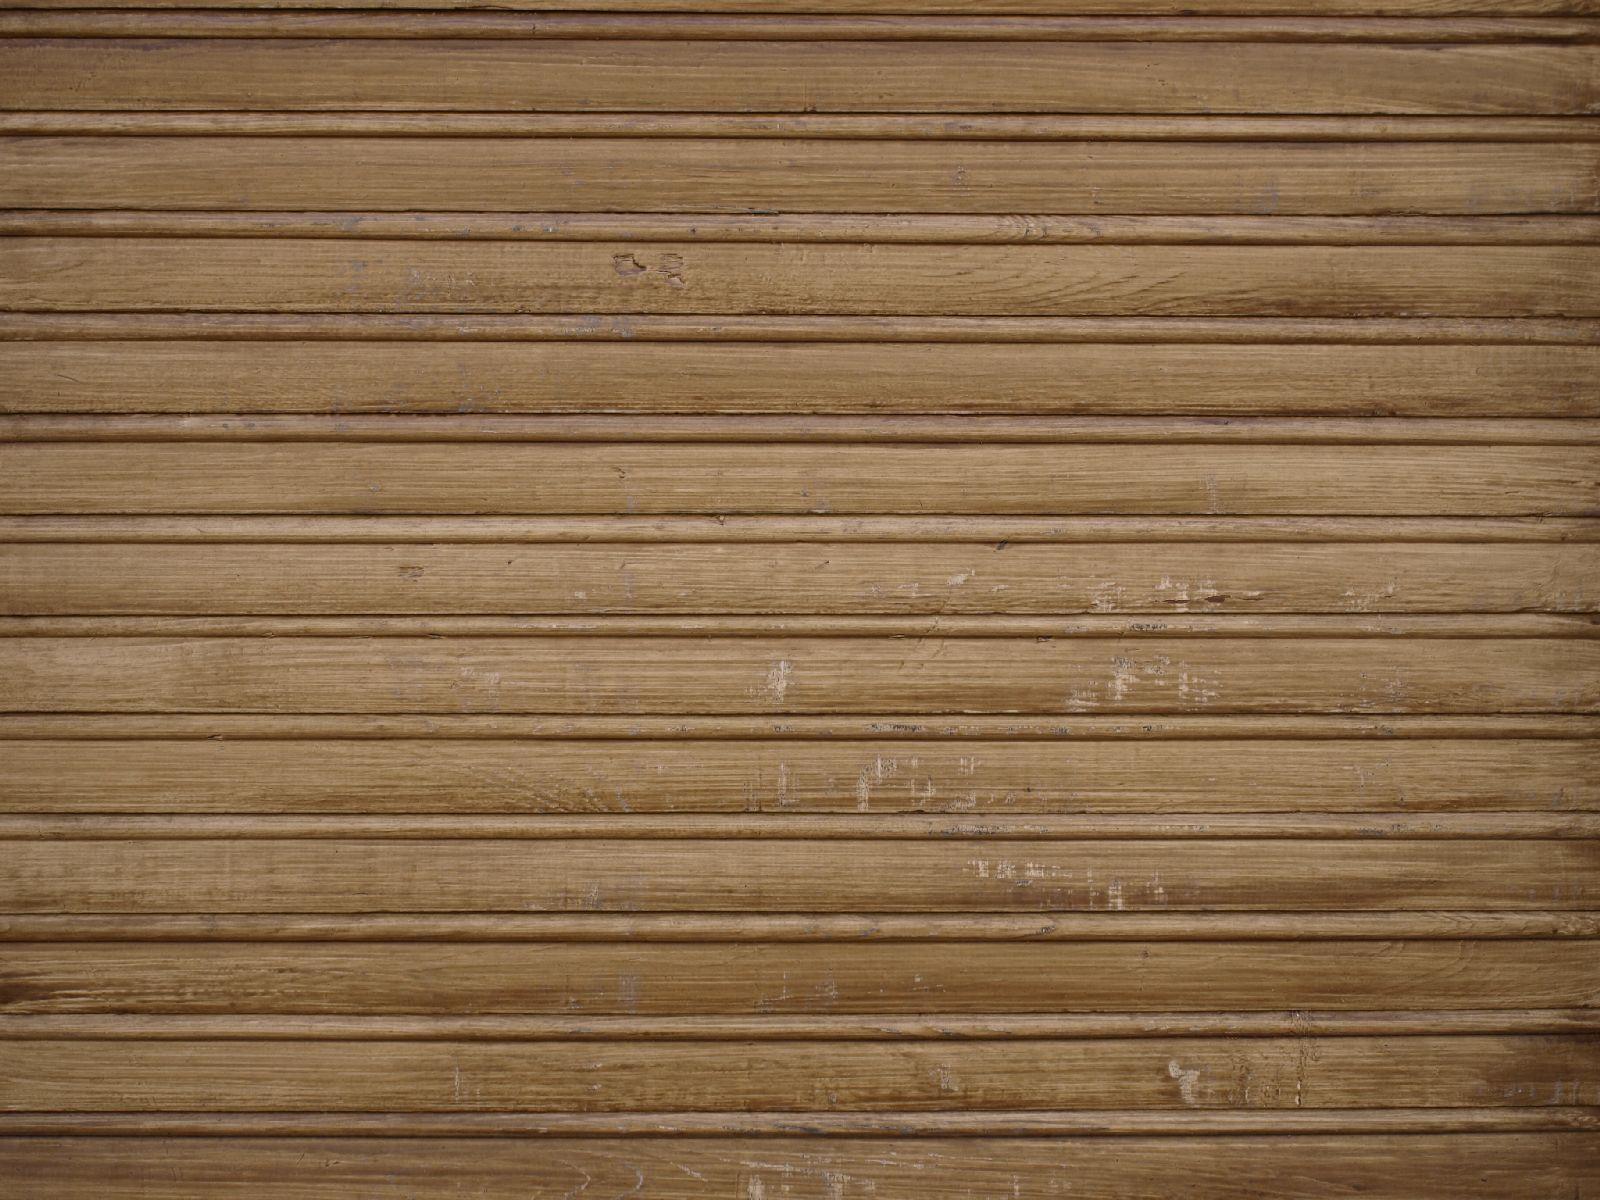 Wood_Texture_A_P2140736